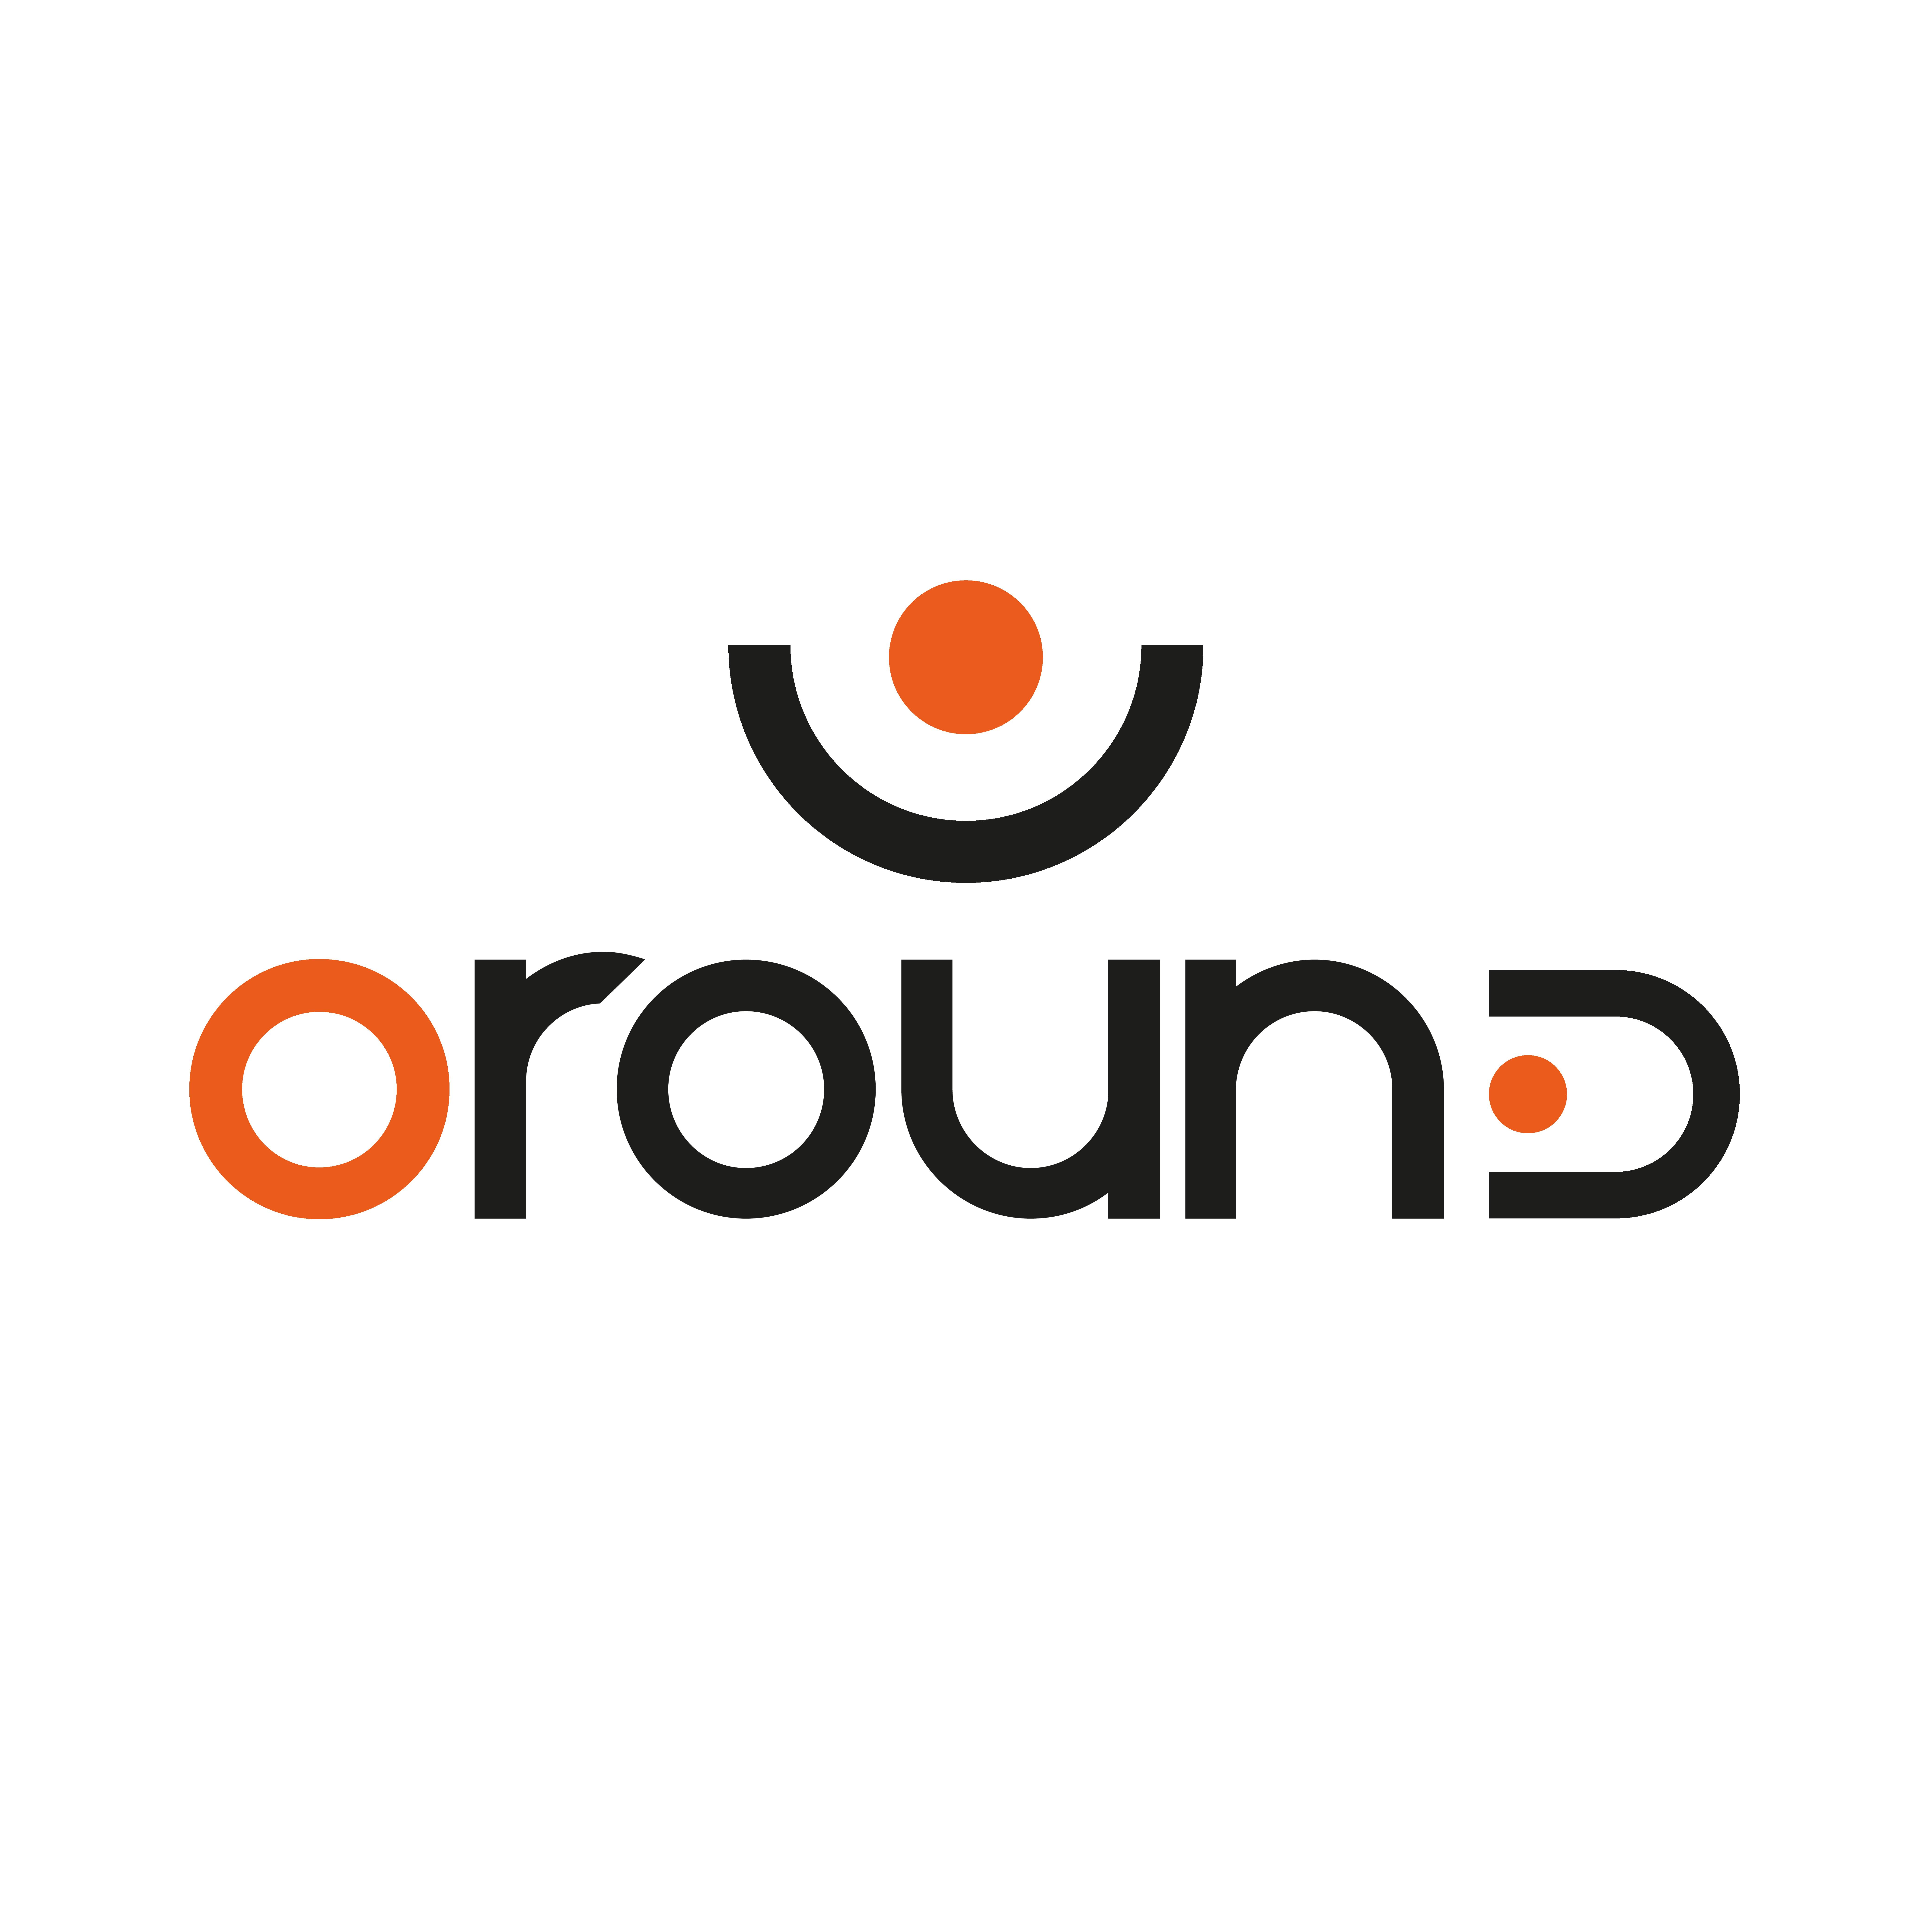 oround